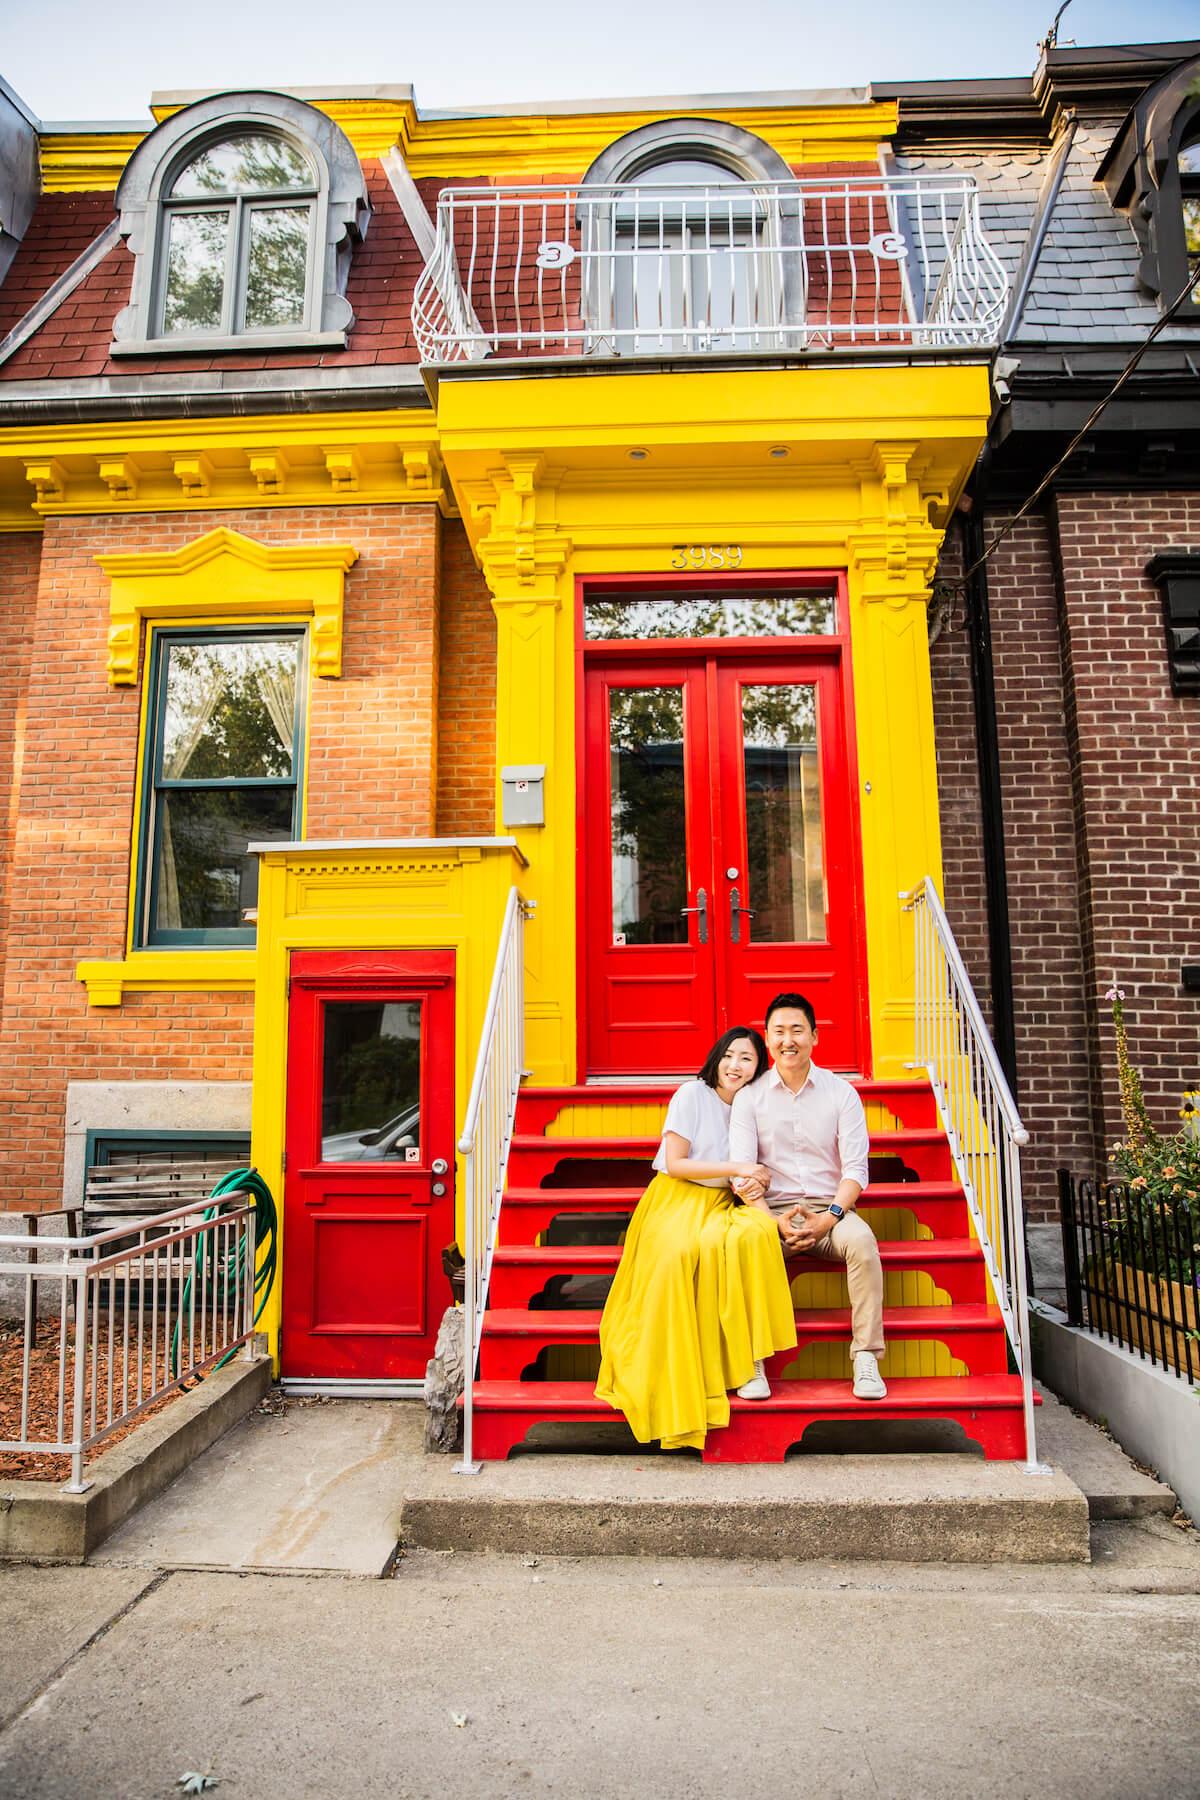 Exploring Montreal in Canada